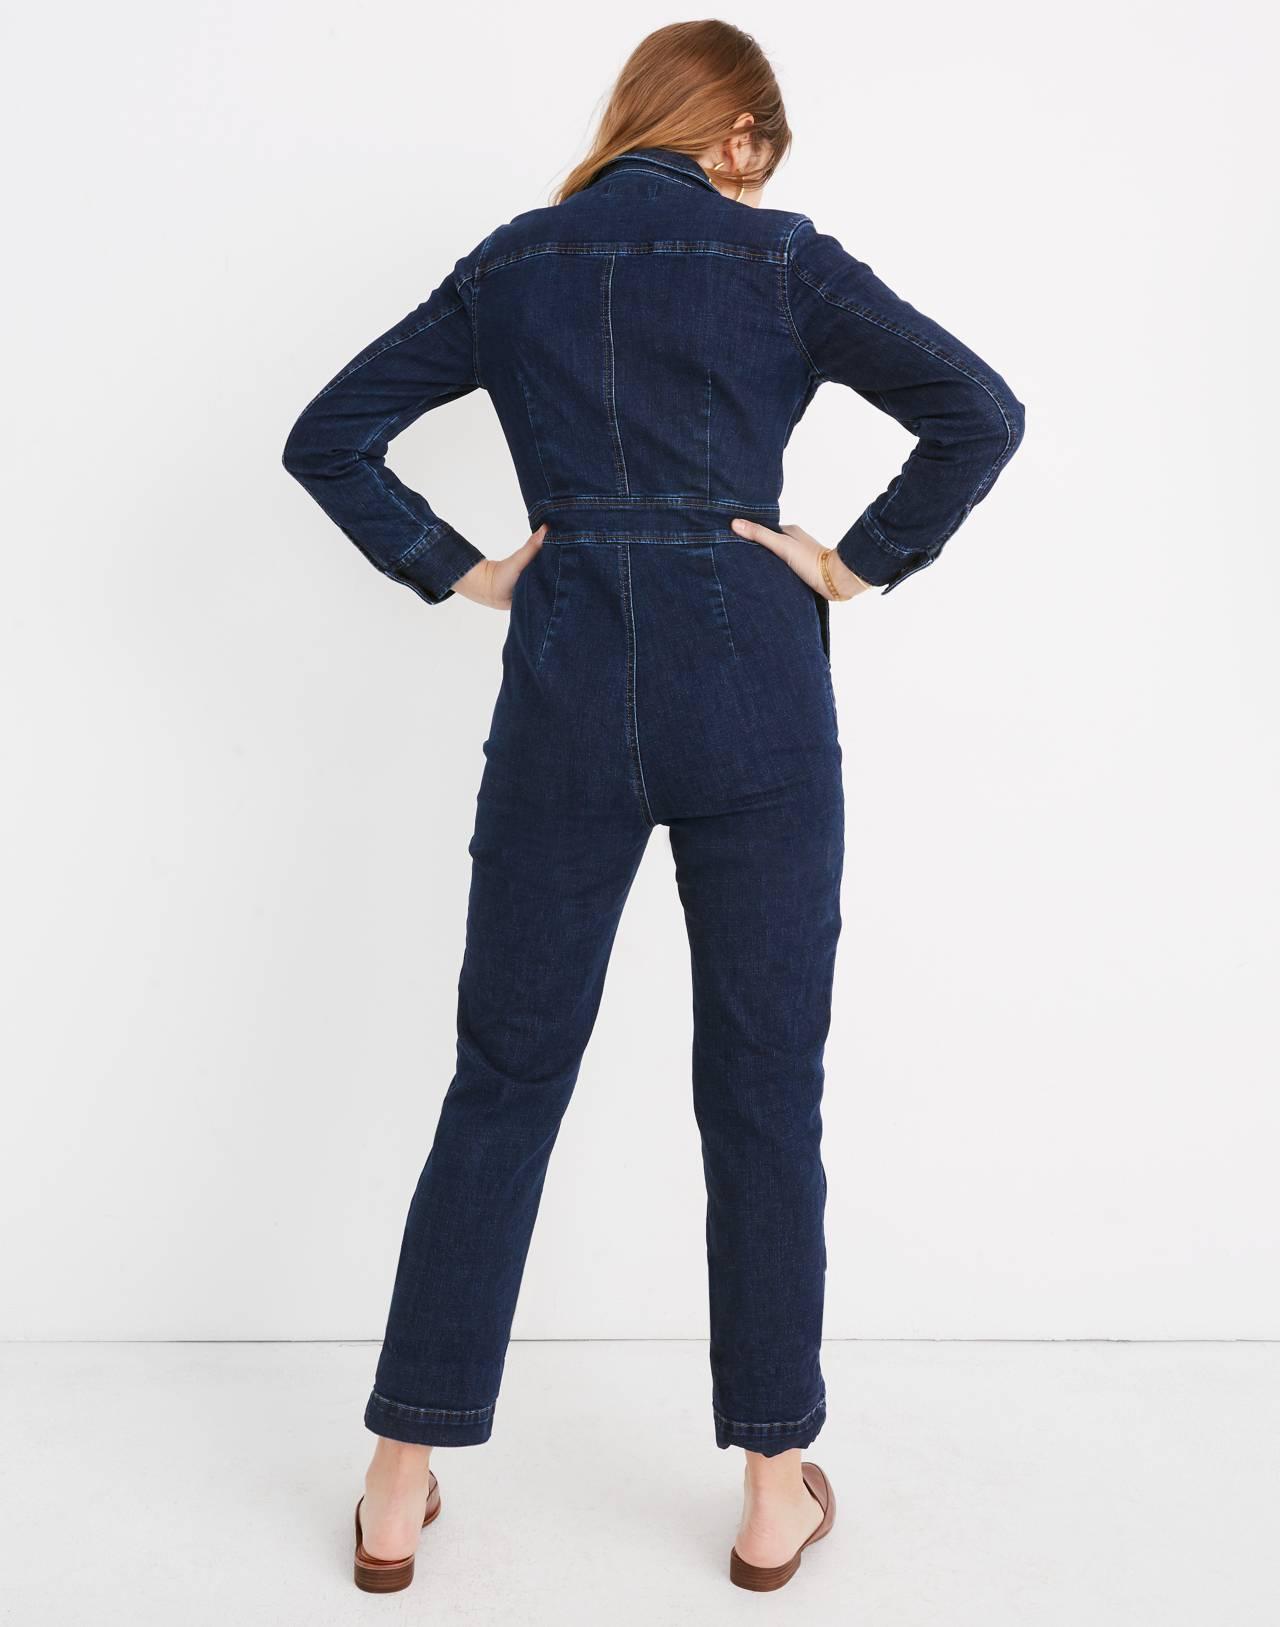 Denim Slim Coverall Jumpsuit in fanning wash image 3